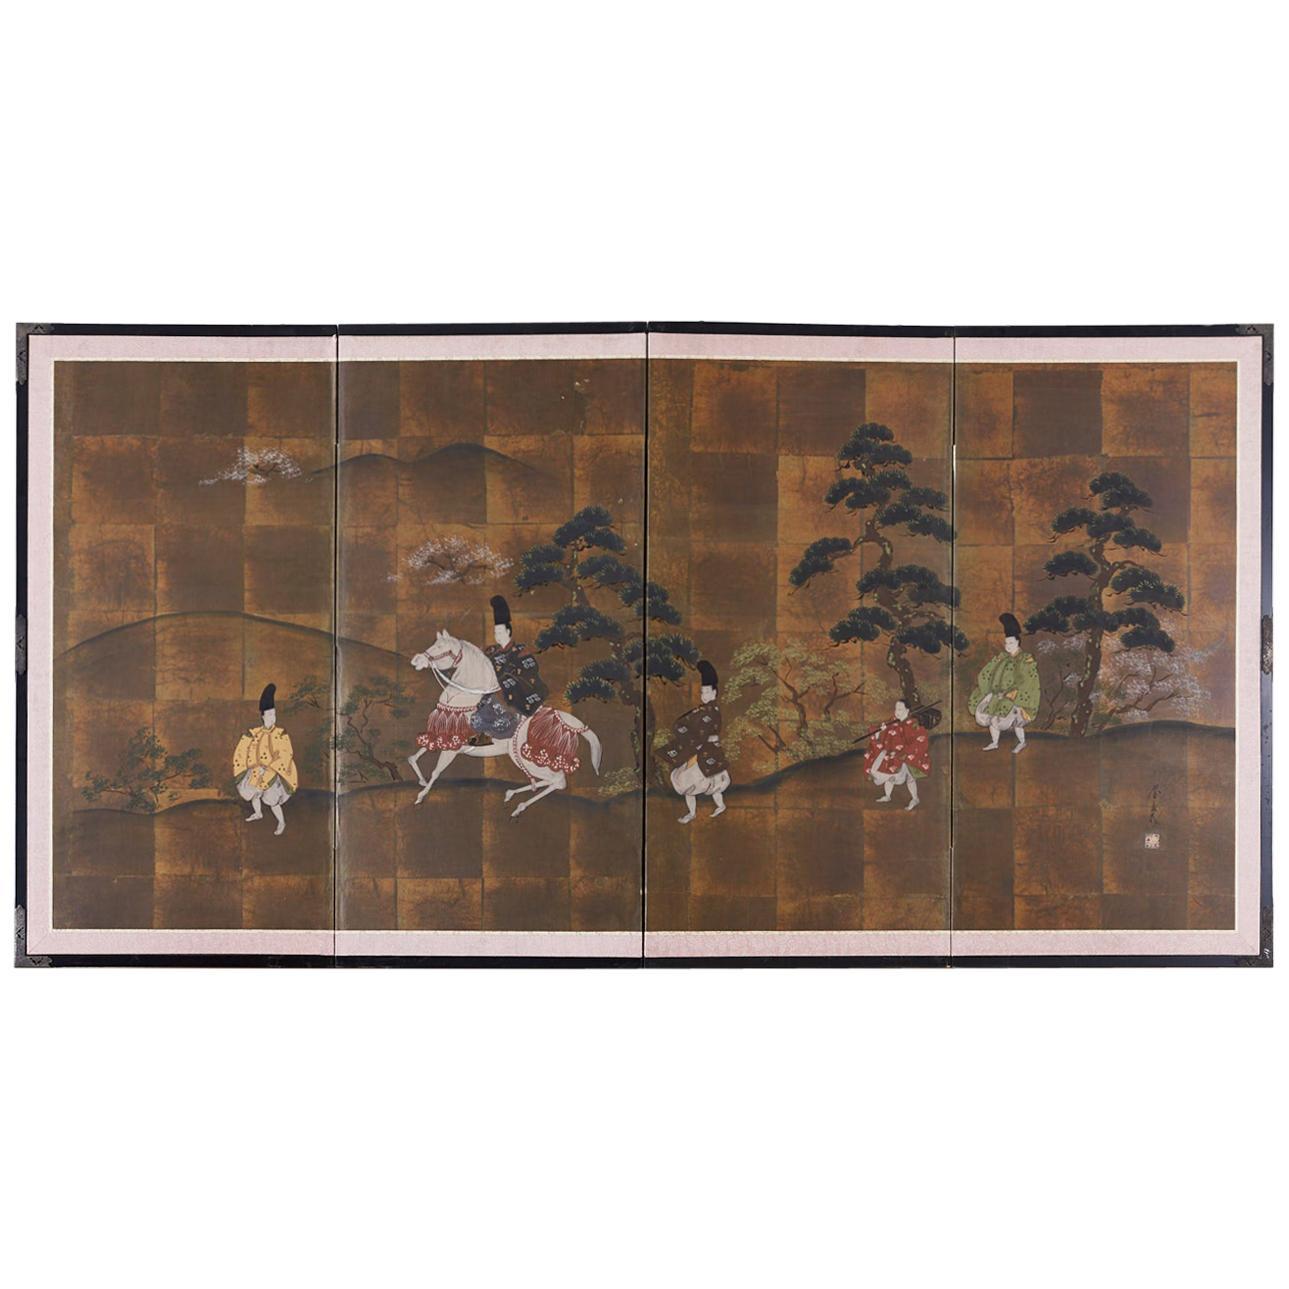 Japanese Four Panel Showa Period Narrative Tale Screen